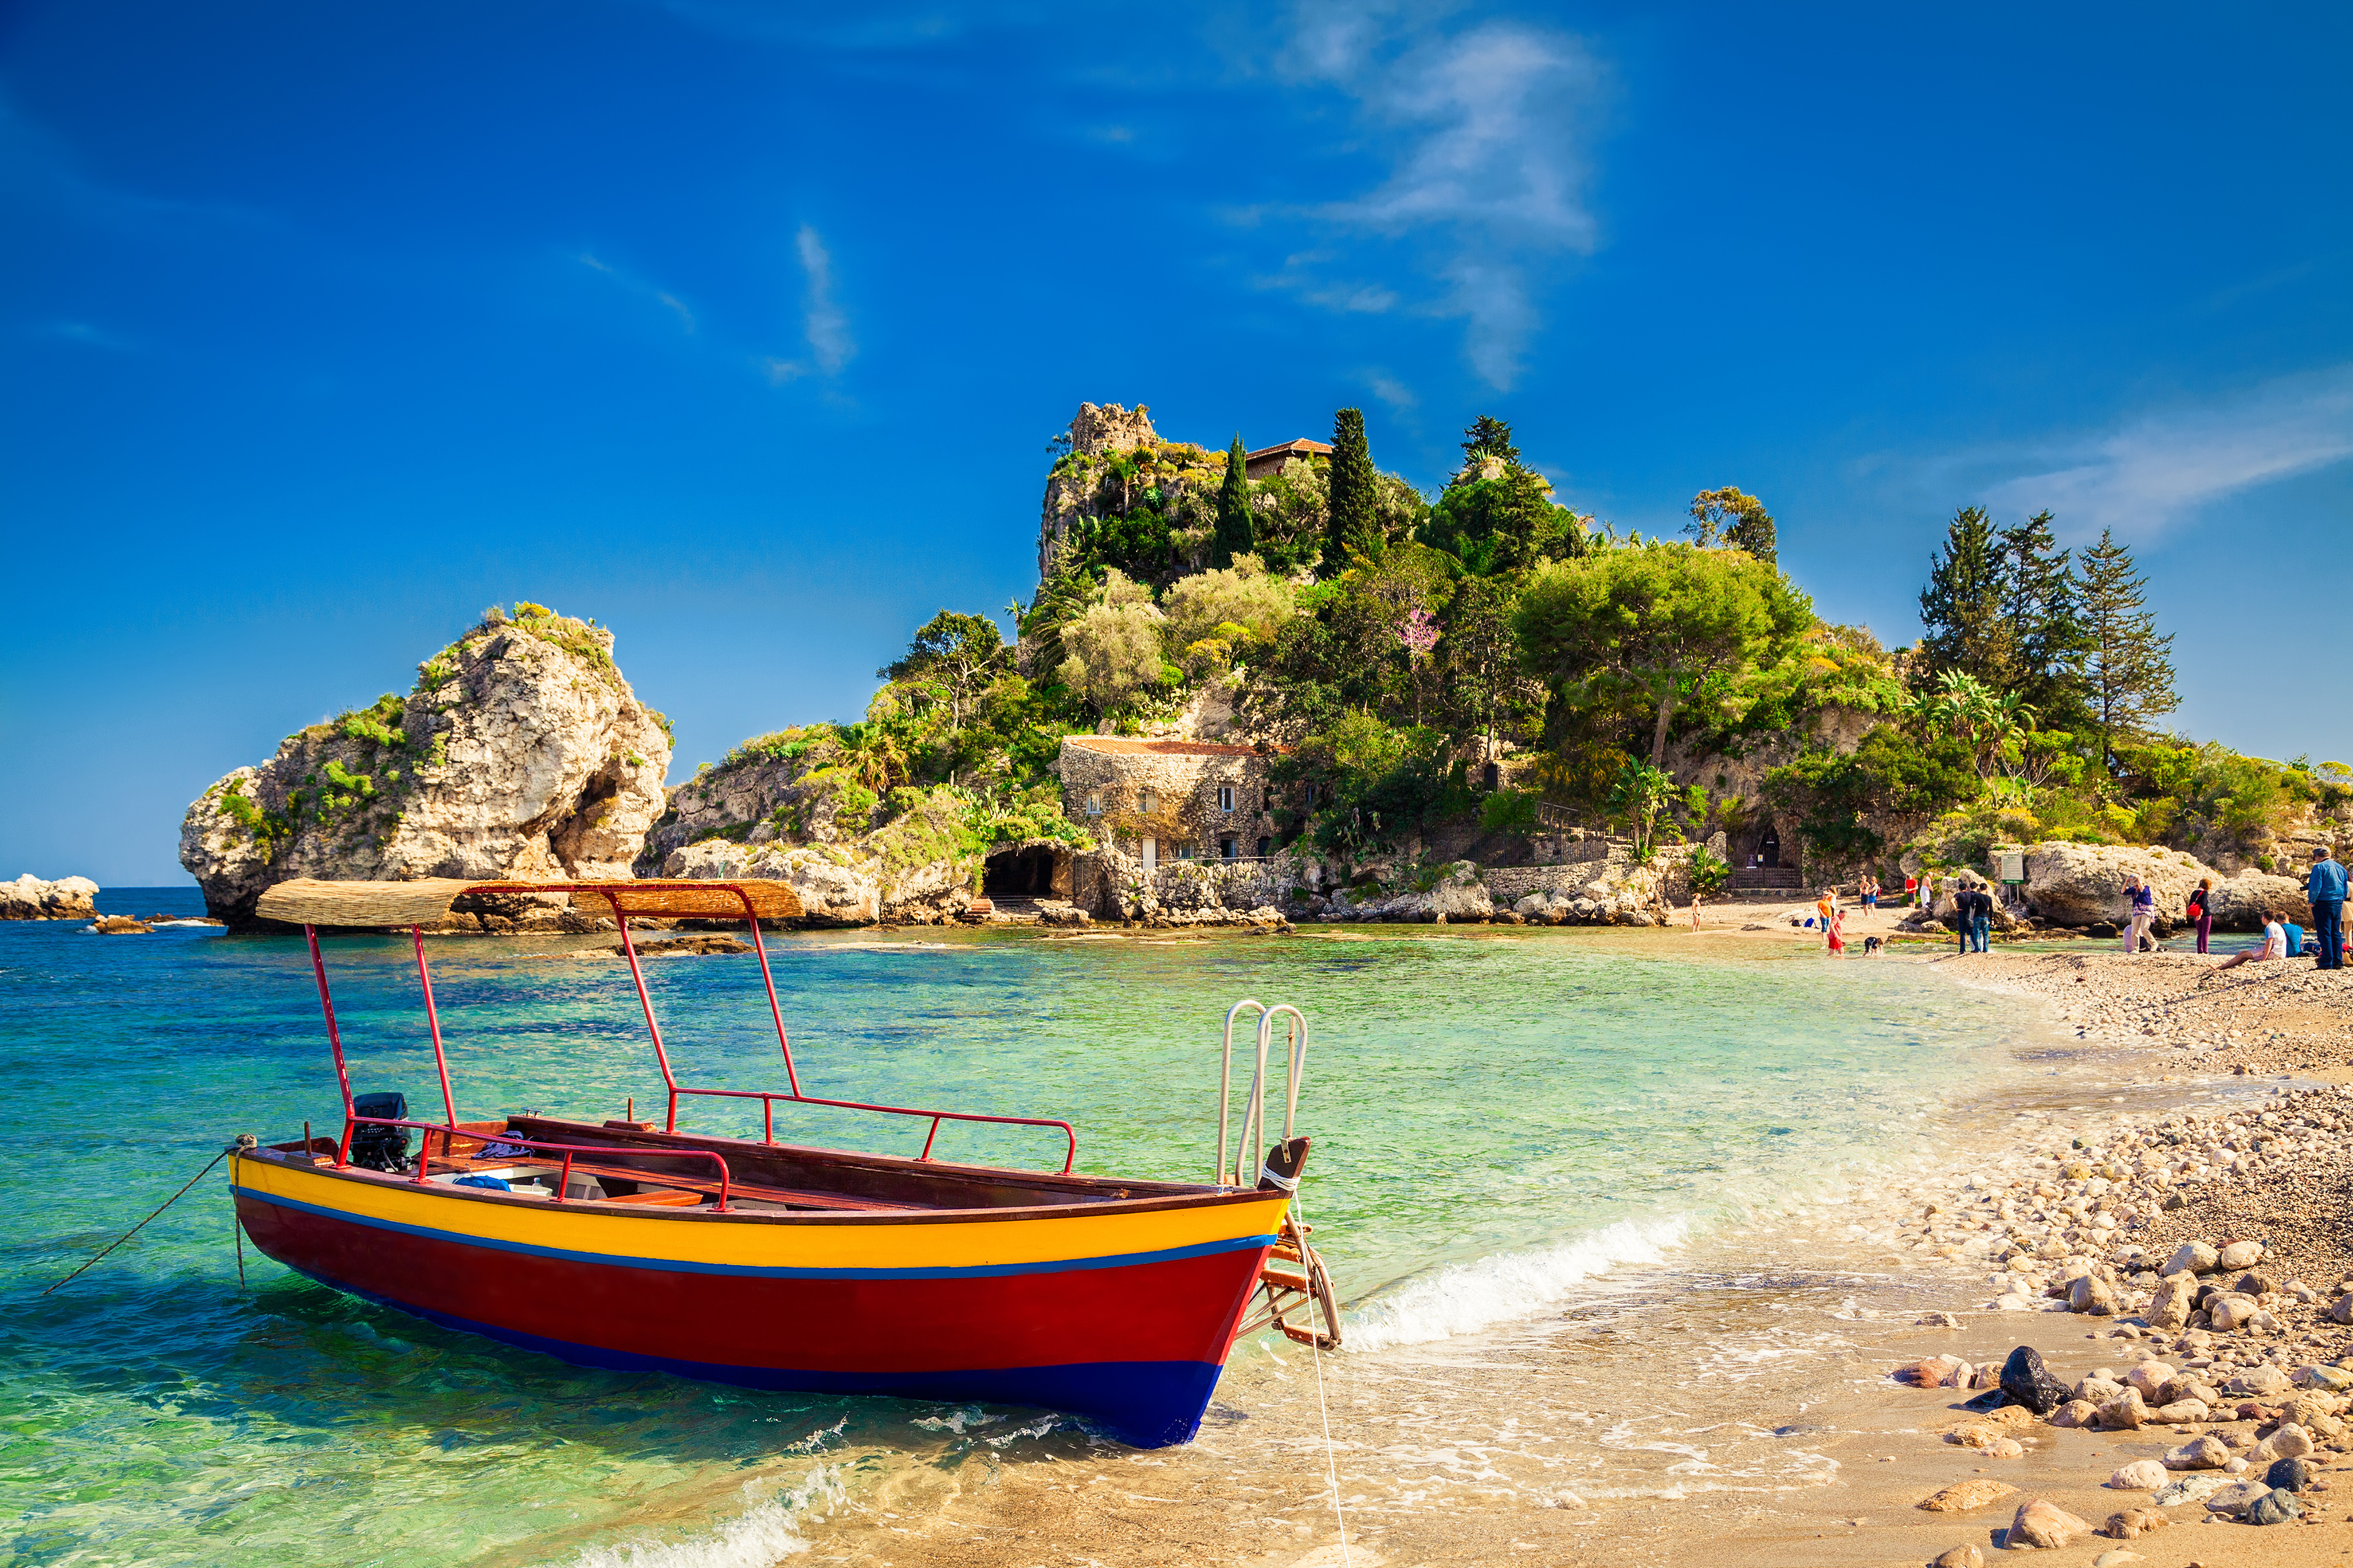 The Sicilian Climate